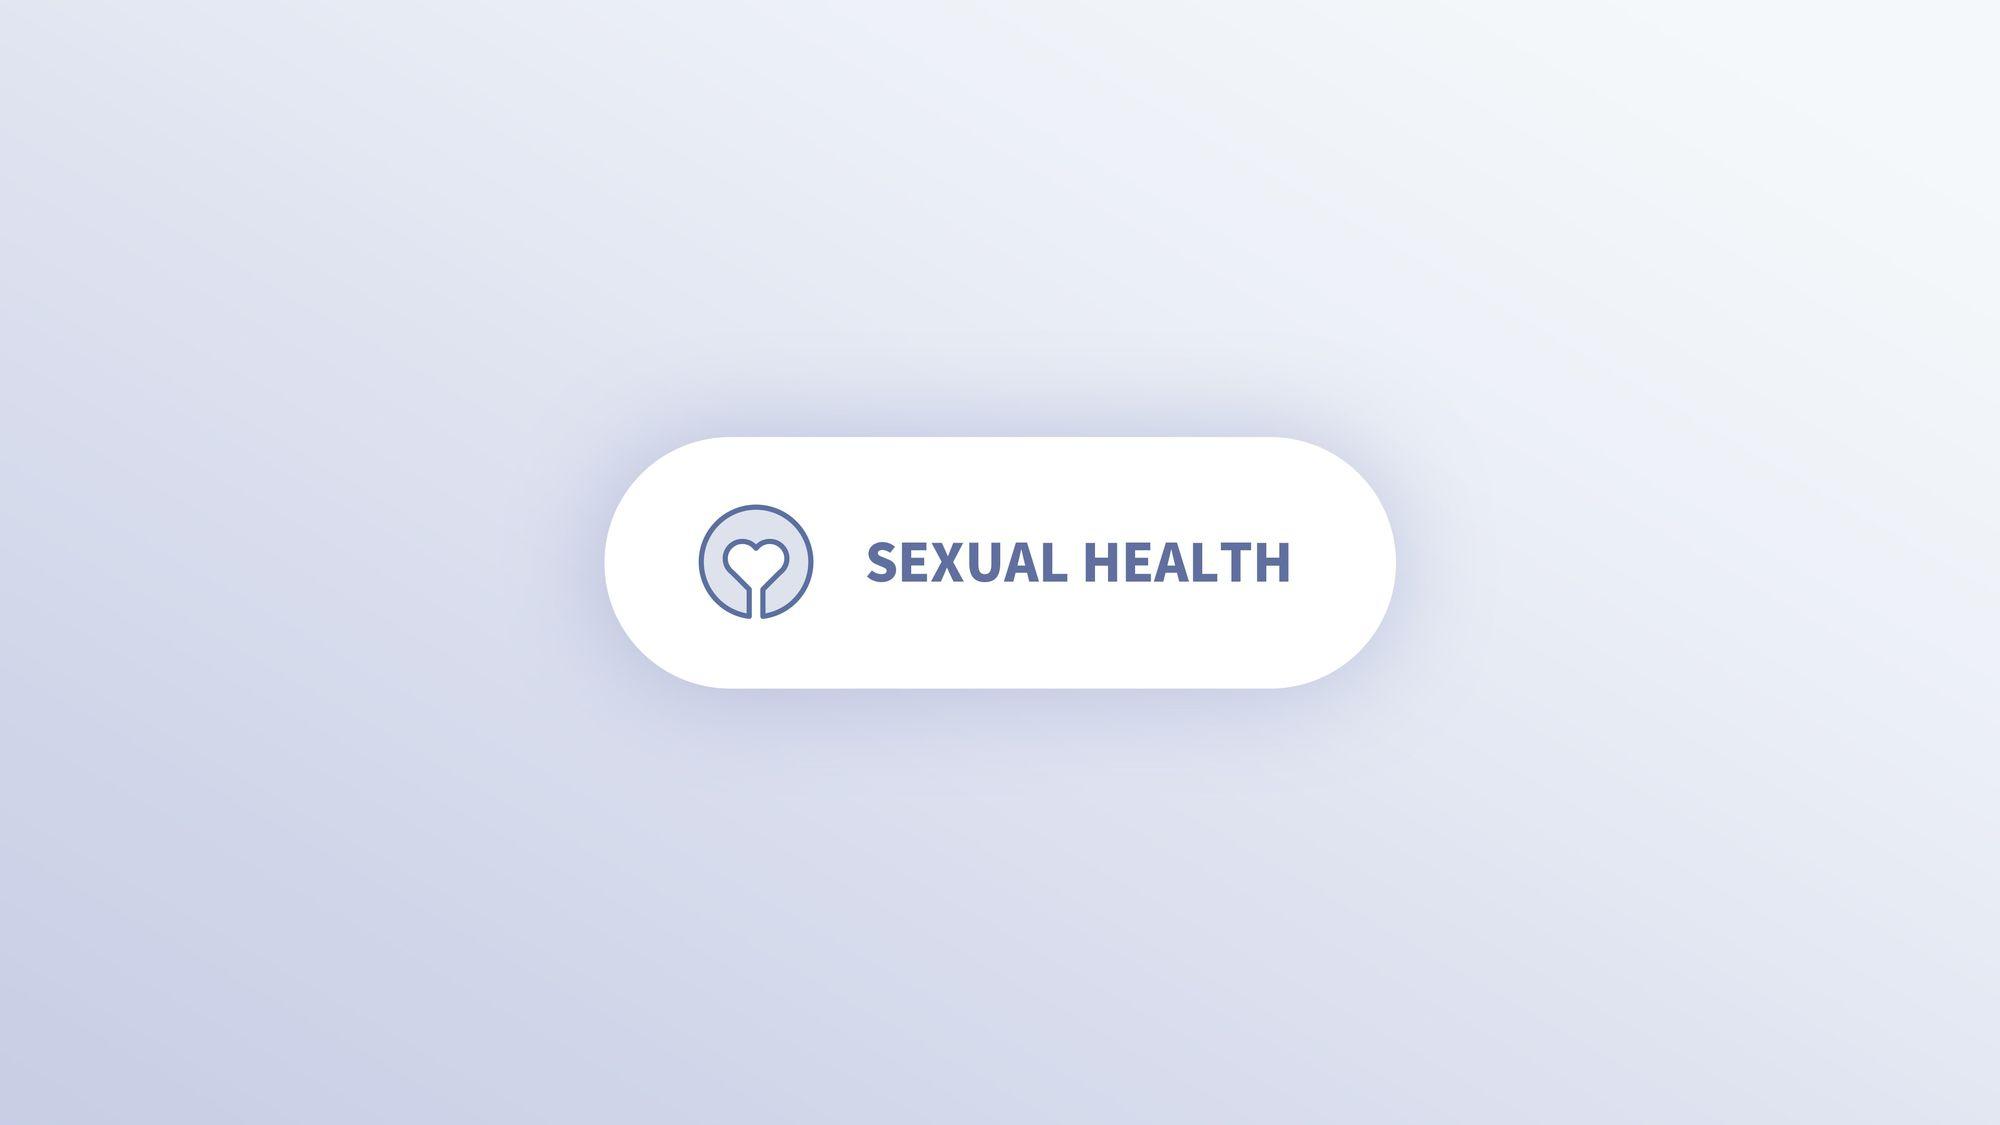 Sexual_Health_Icon  6  3